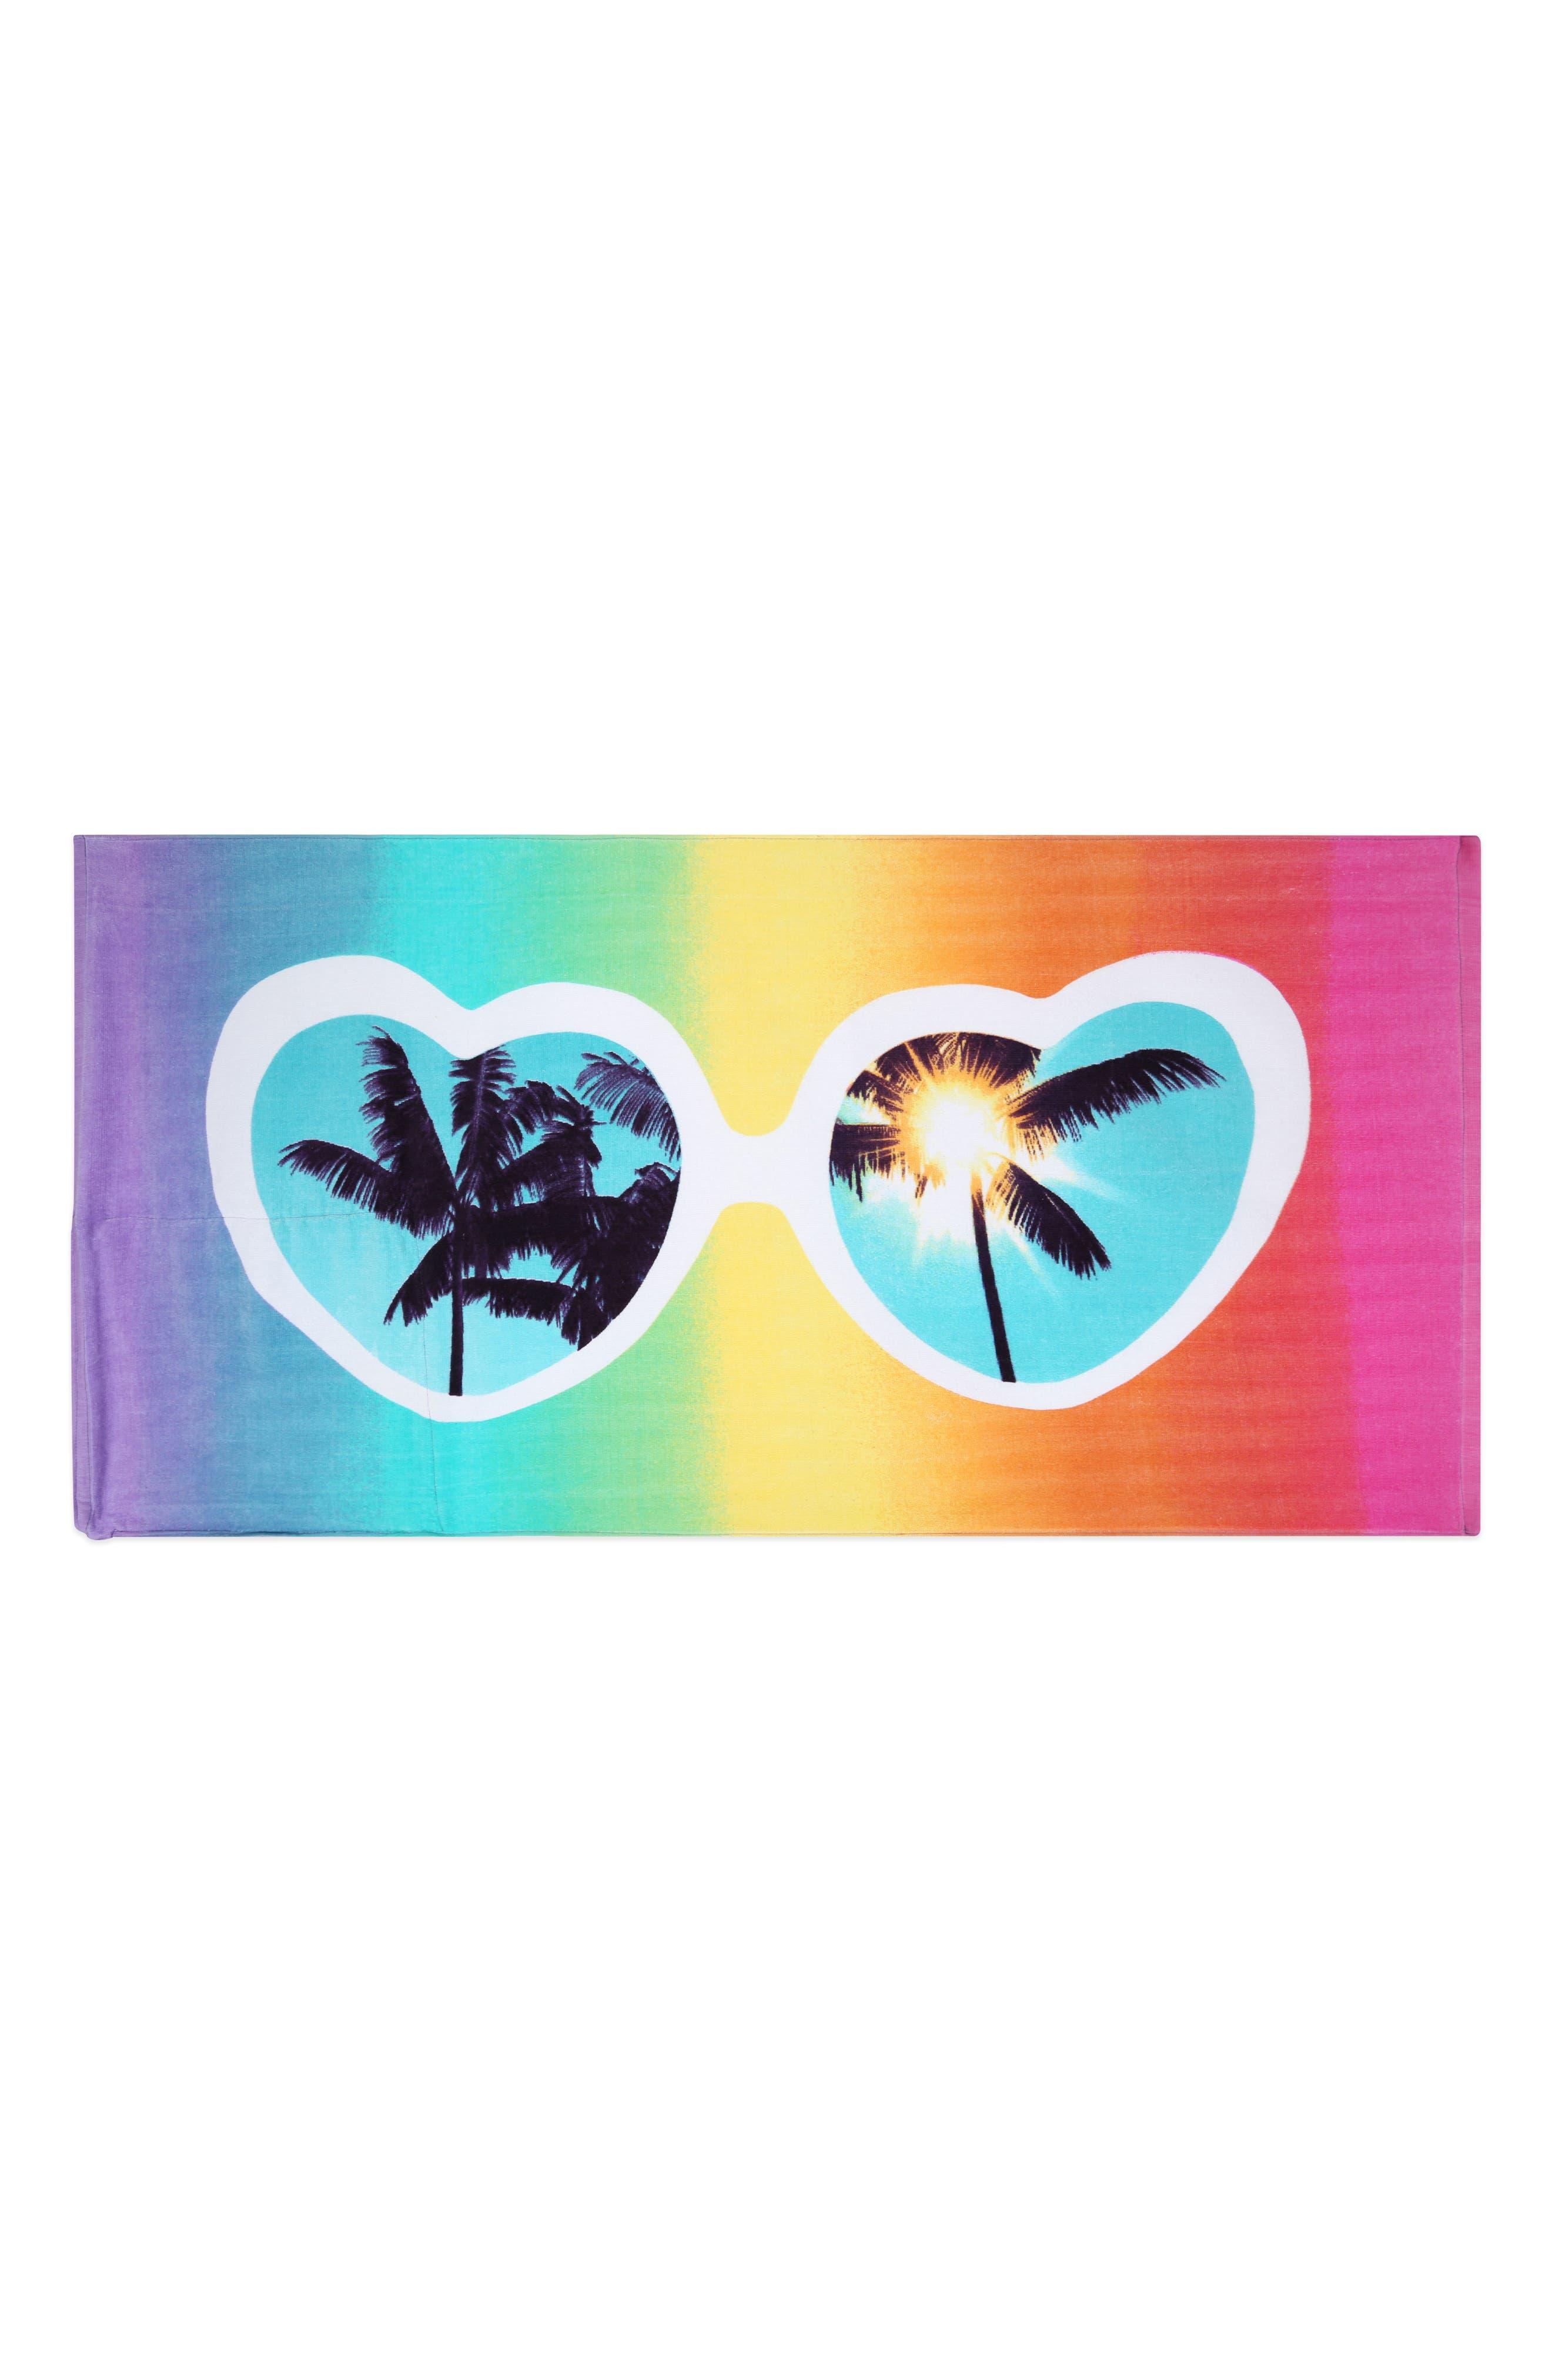 Heart Sunnies Towel Backpack,                             Main thumbnail 1, color,                             475